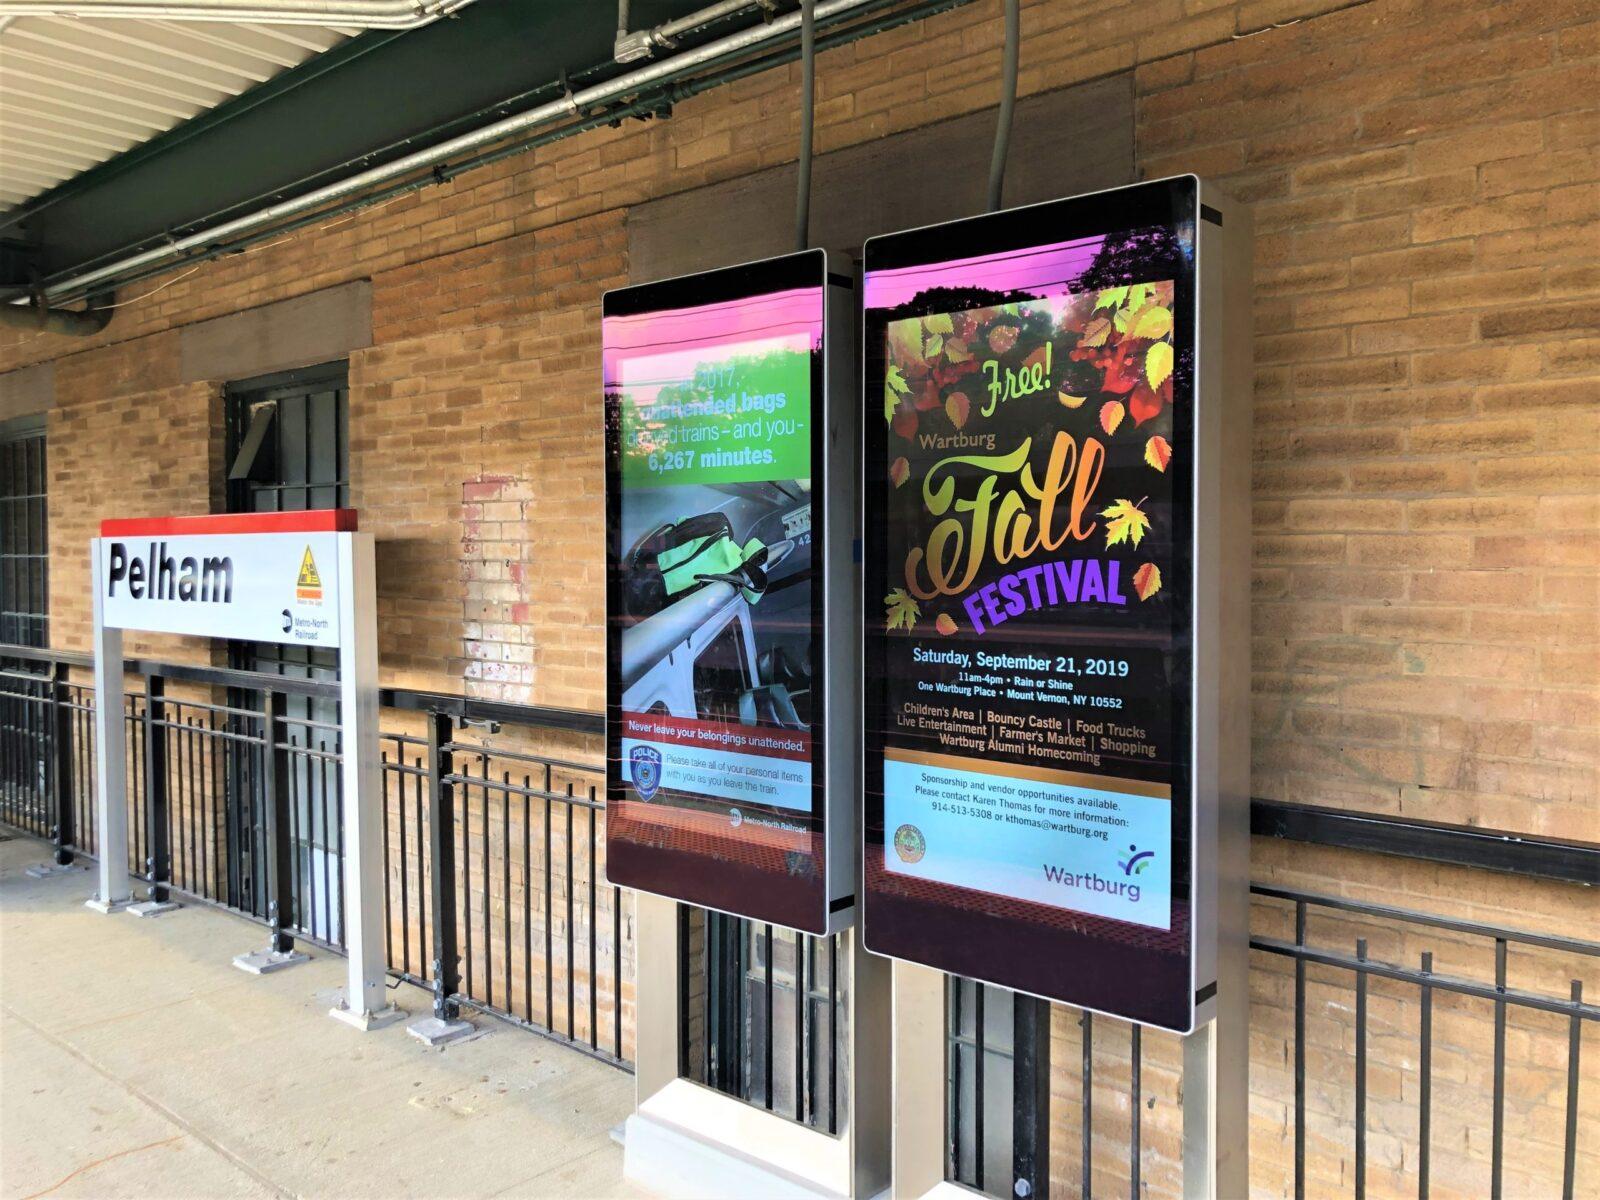 Wartburg Rail Digital Platform Advertising